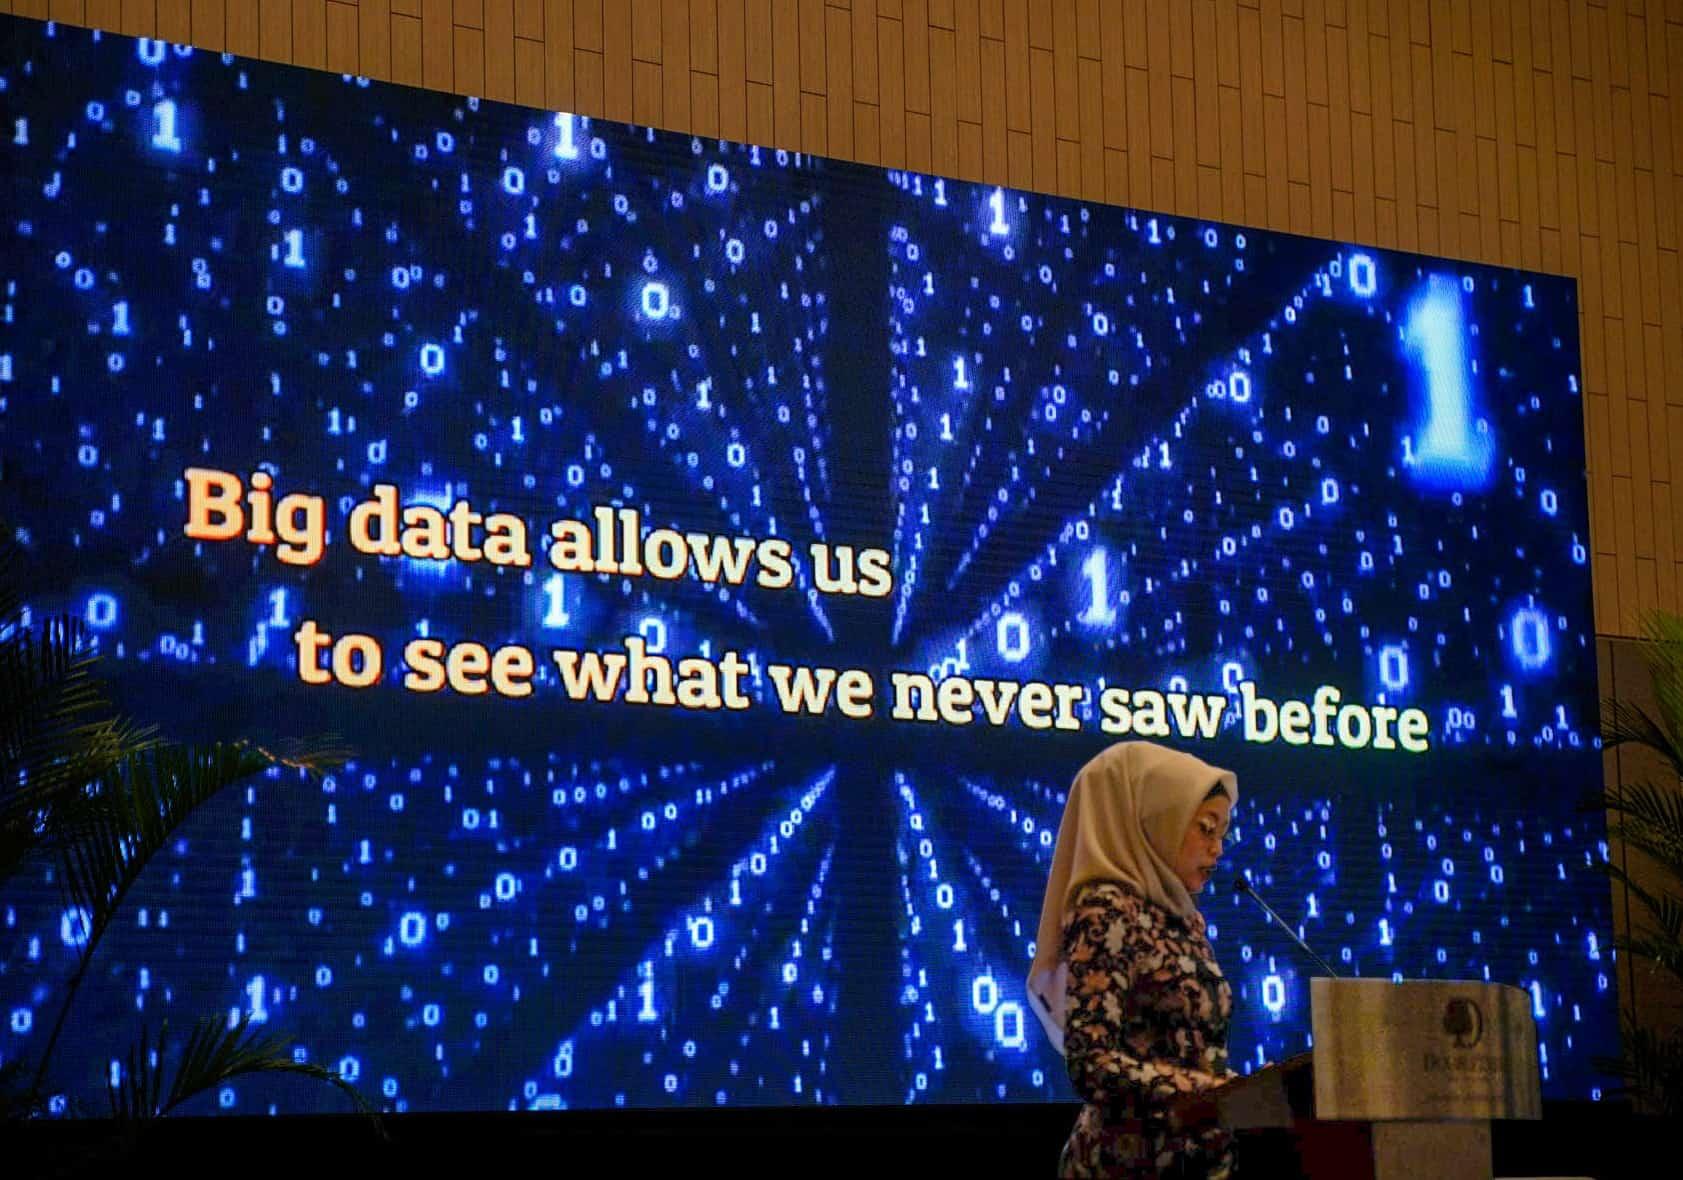 ASEAN-Workshop-3-18-10-Big-data